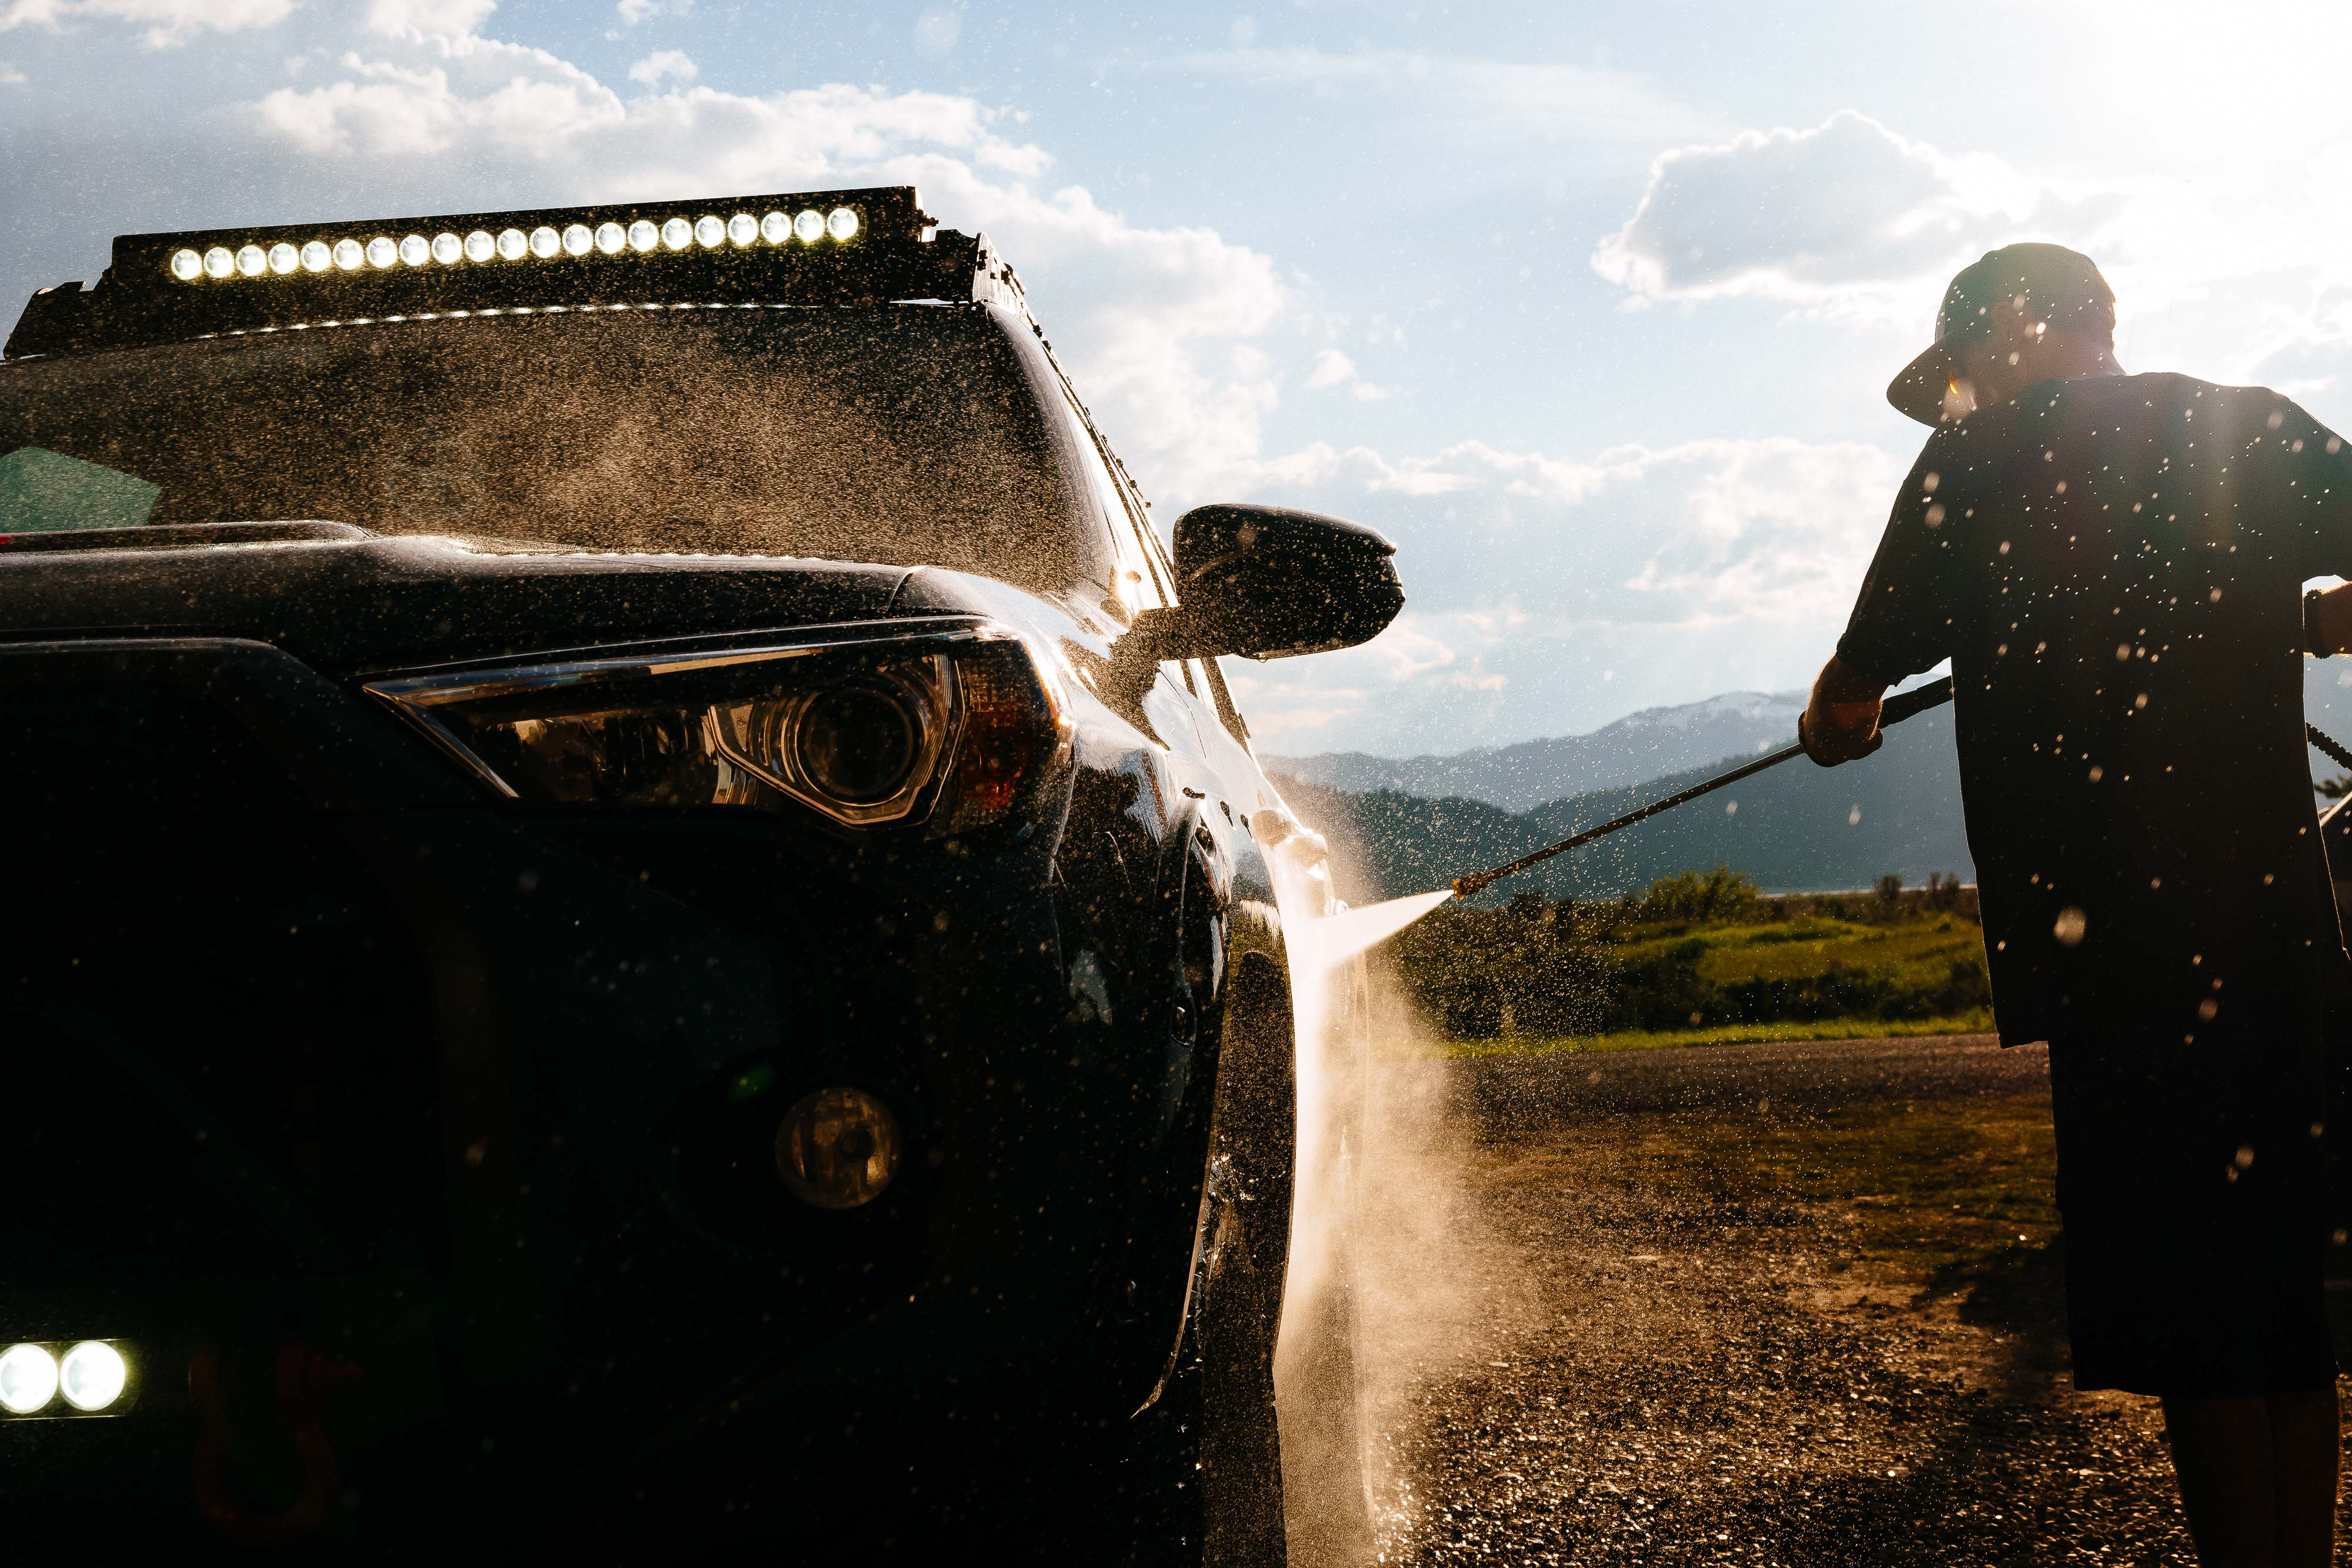 Pressure washing the truck at sunset - Portfolio Photo - By Jay Goodrich